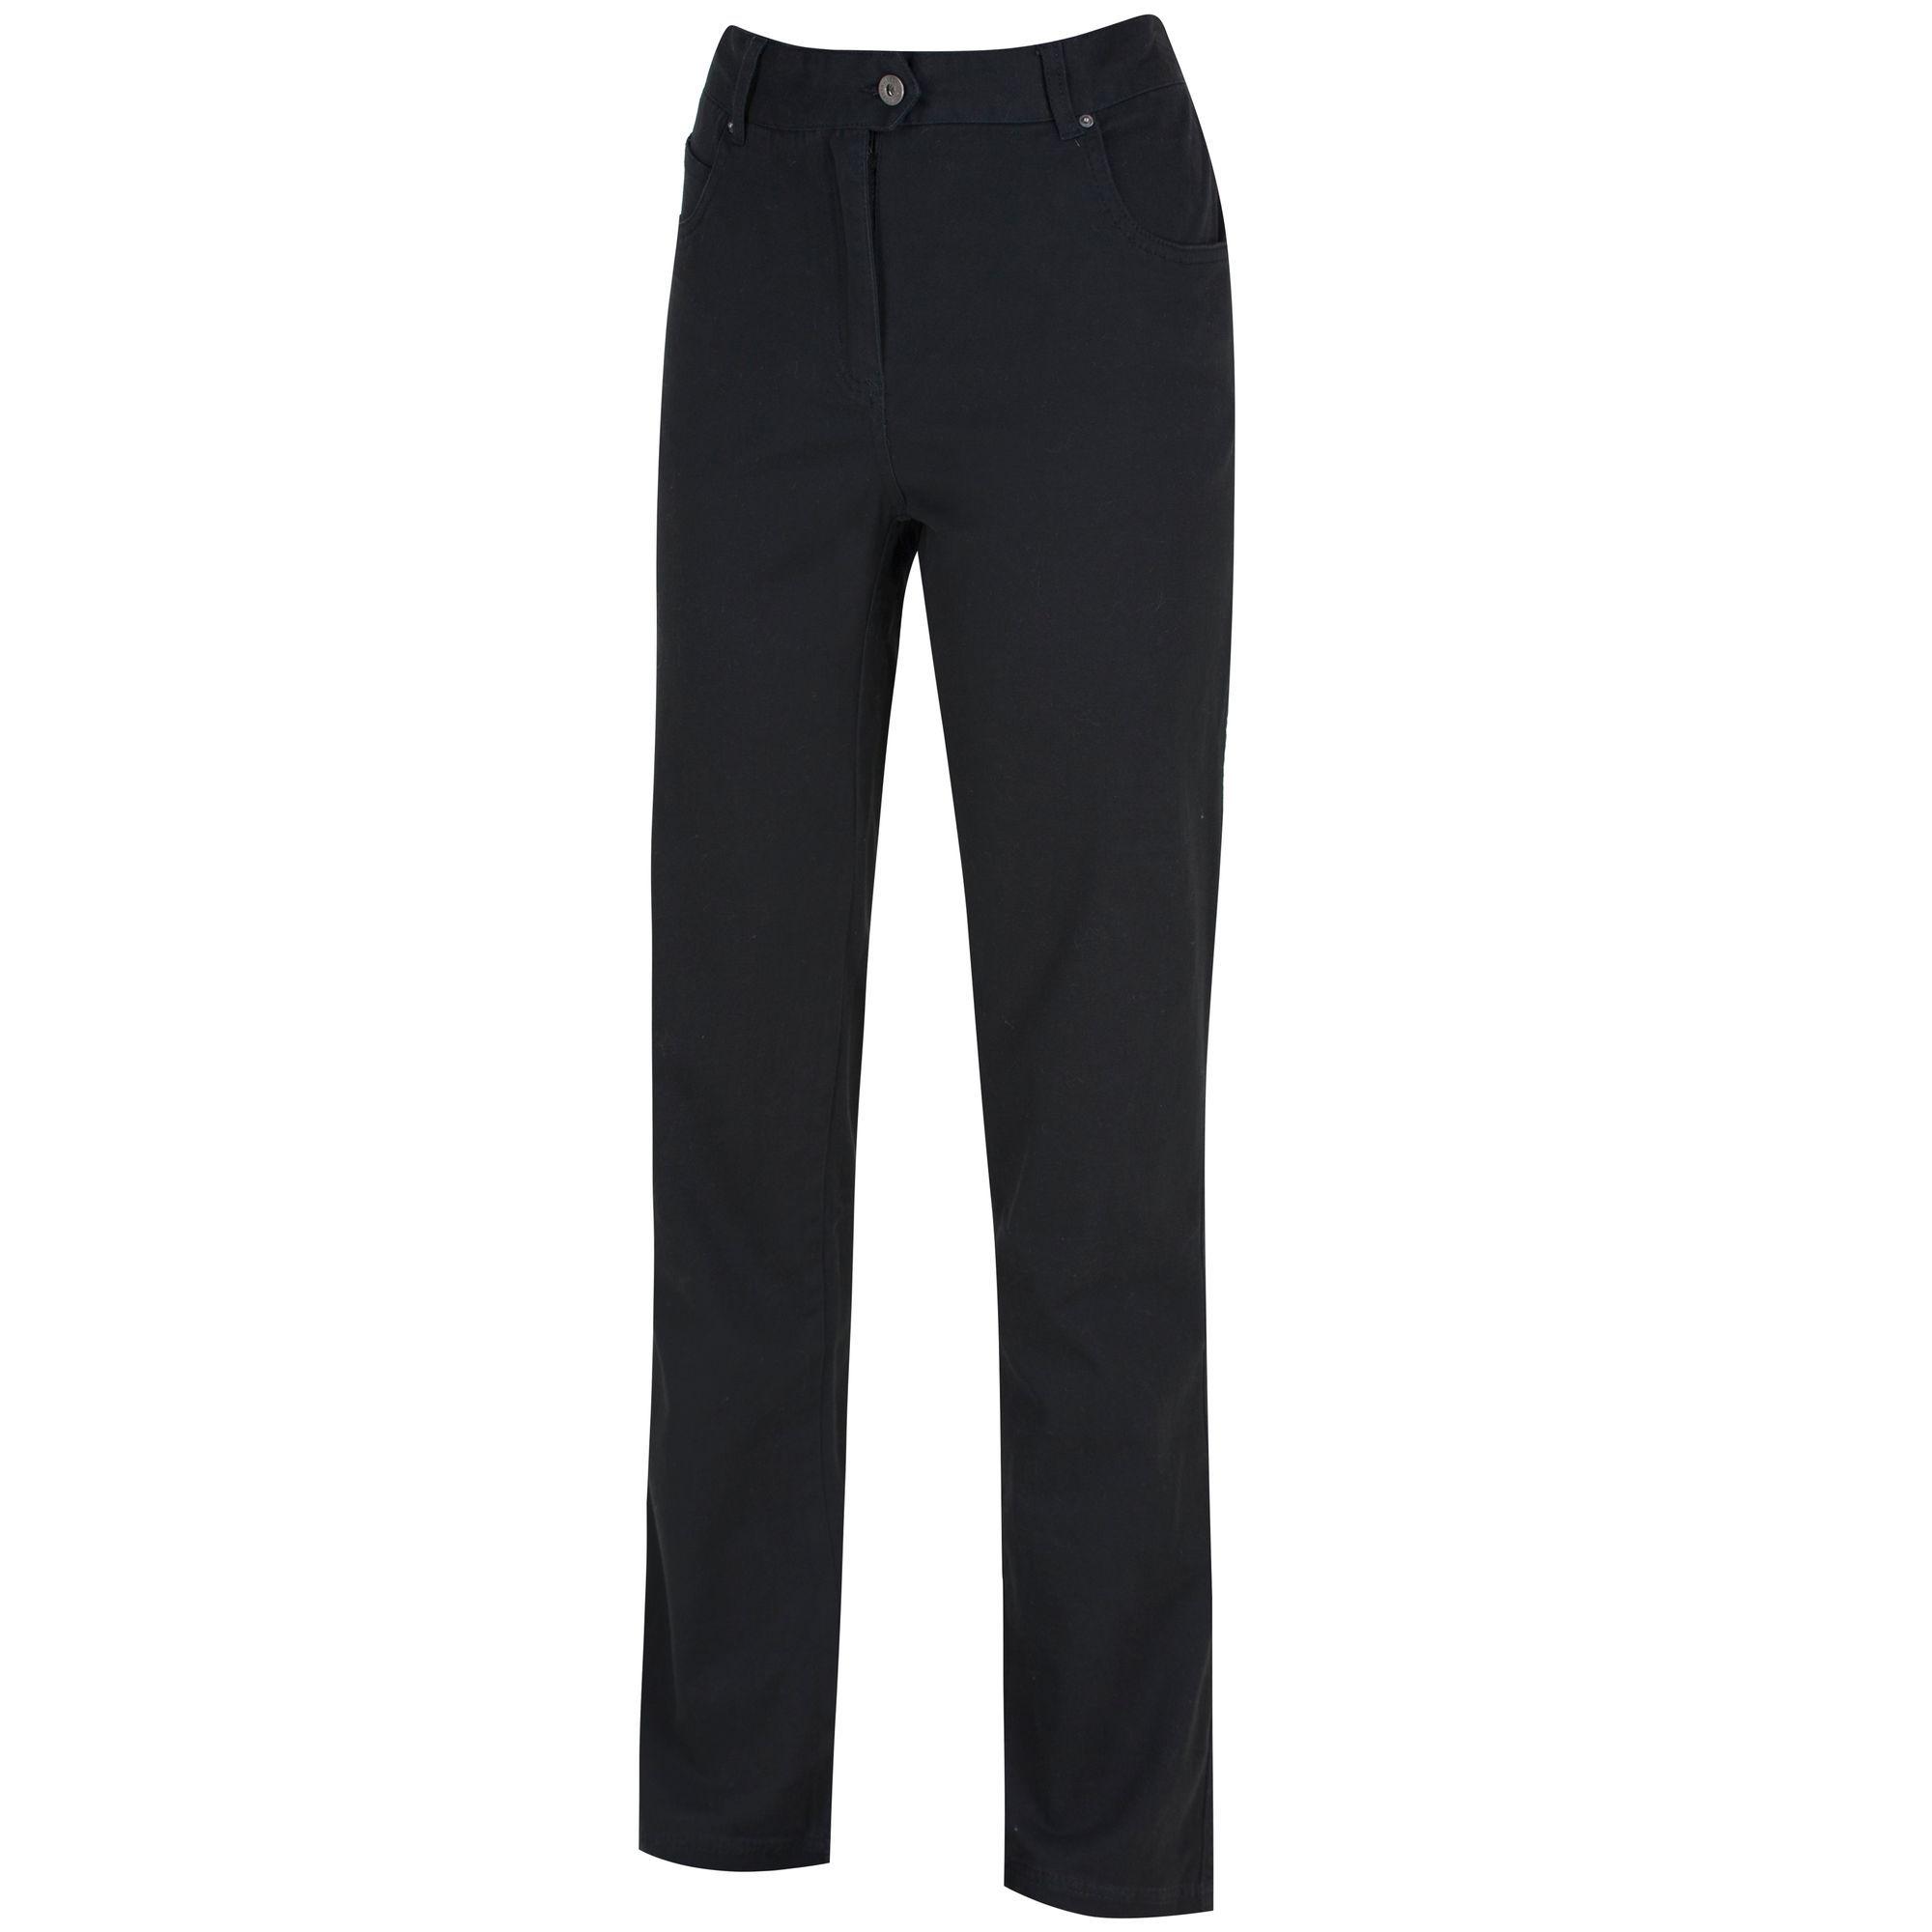 Regatta-Pantalon-en-coton-DAMIRA-Femme-RG3103 miniature 4